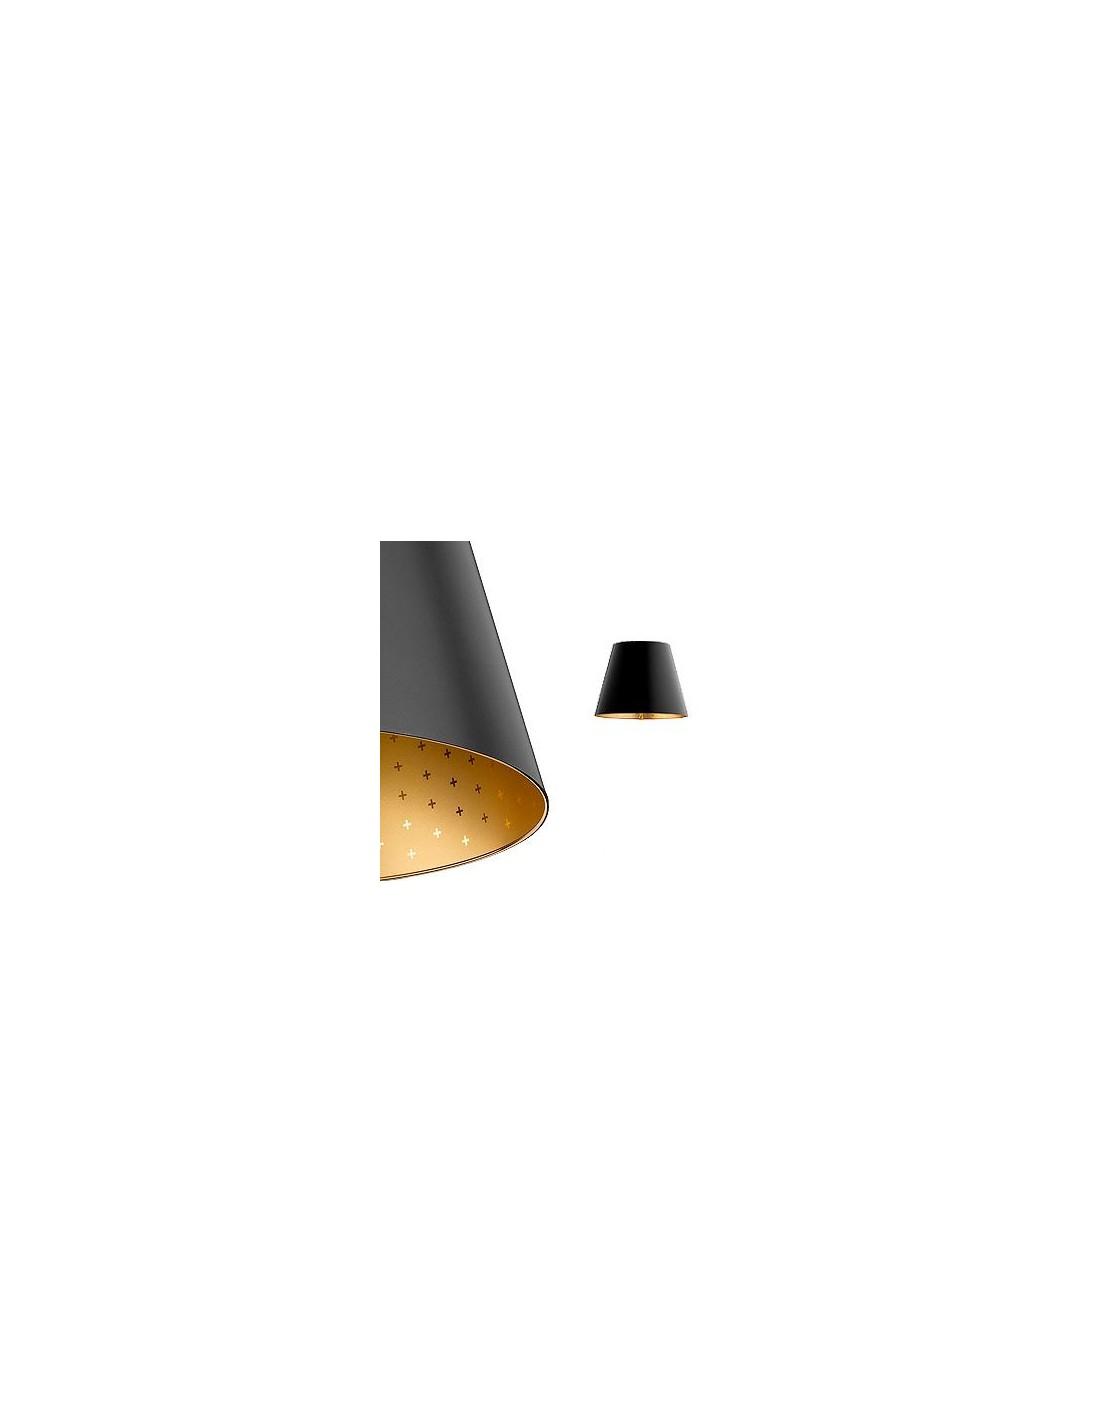 Lampe de table Gun Philippe Starck Flos Valente Design